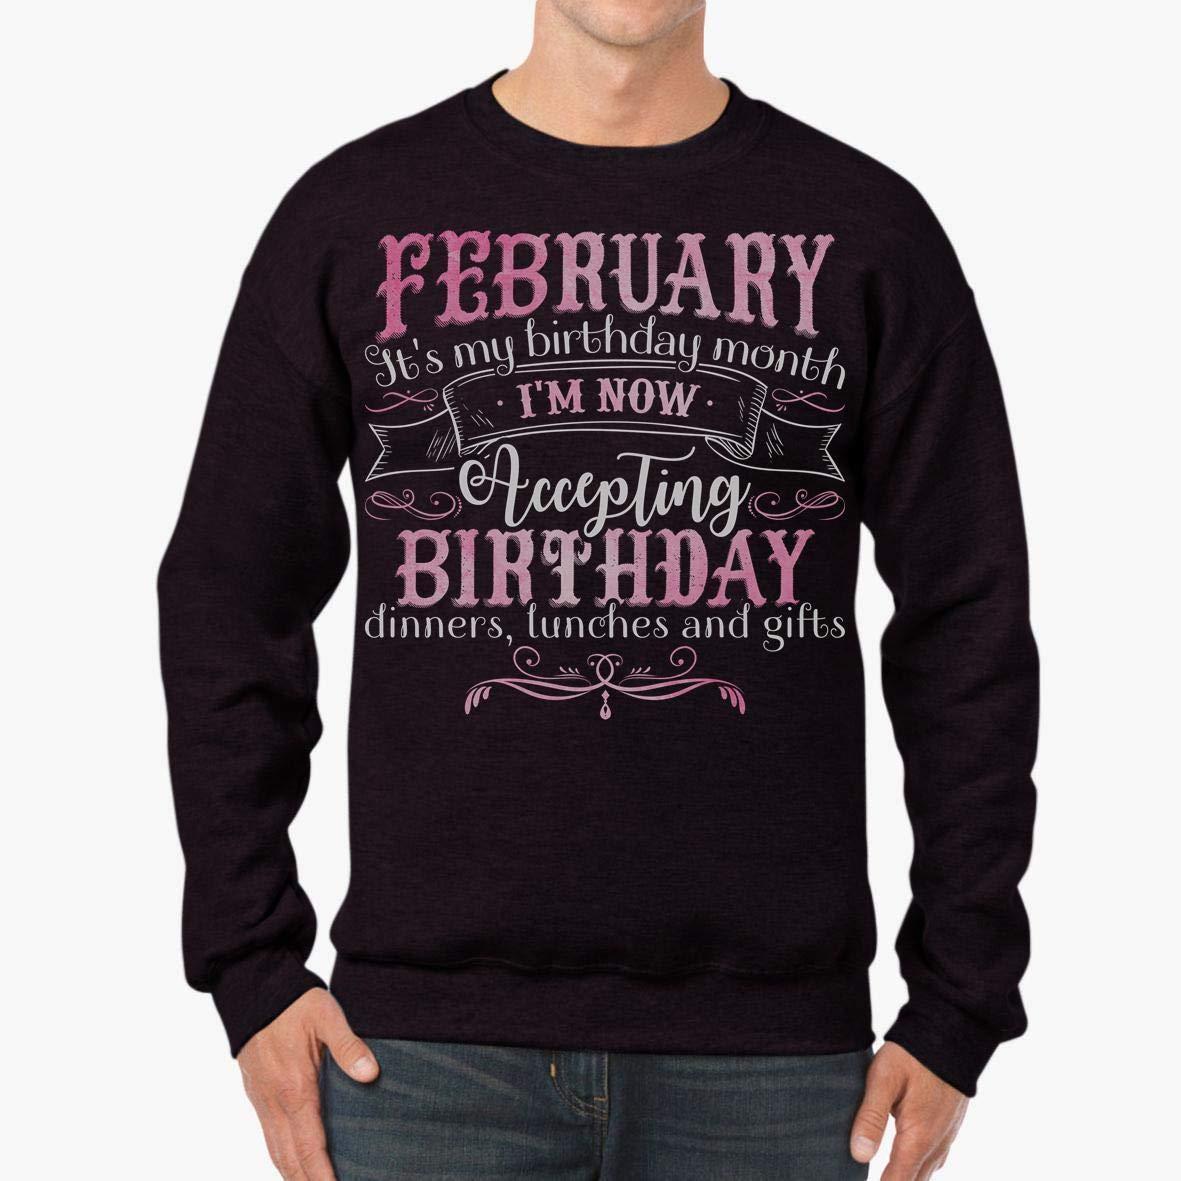 Doryti February Its My Birthday Month Awesome Gift Unisex Sweatshirt tee